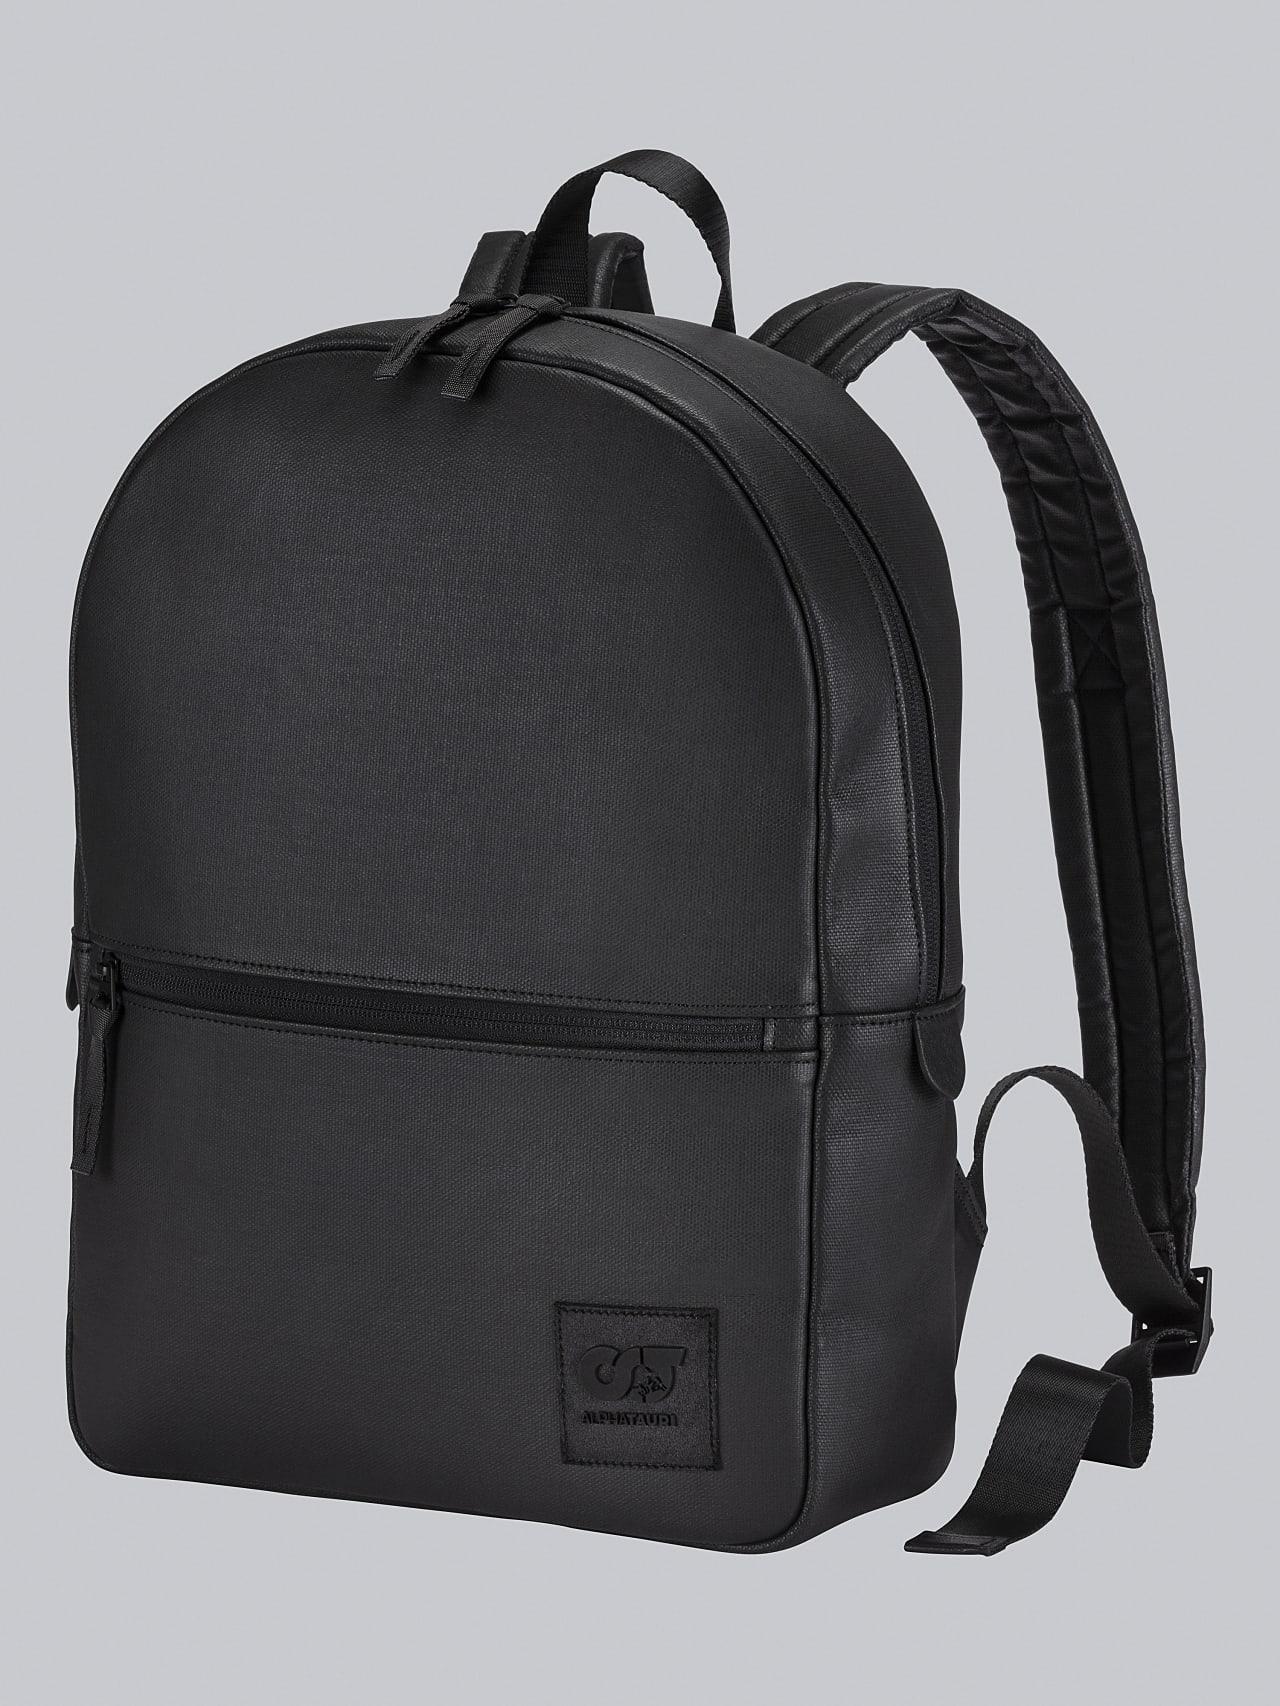 AREKK V2.Y5.02 Water-Repellent Backpack dark grey / anthracite Back Alpha Tauri